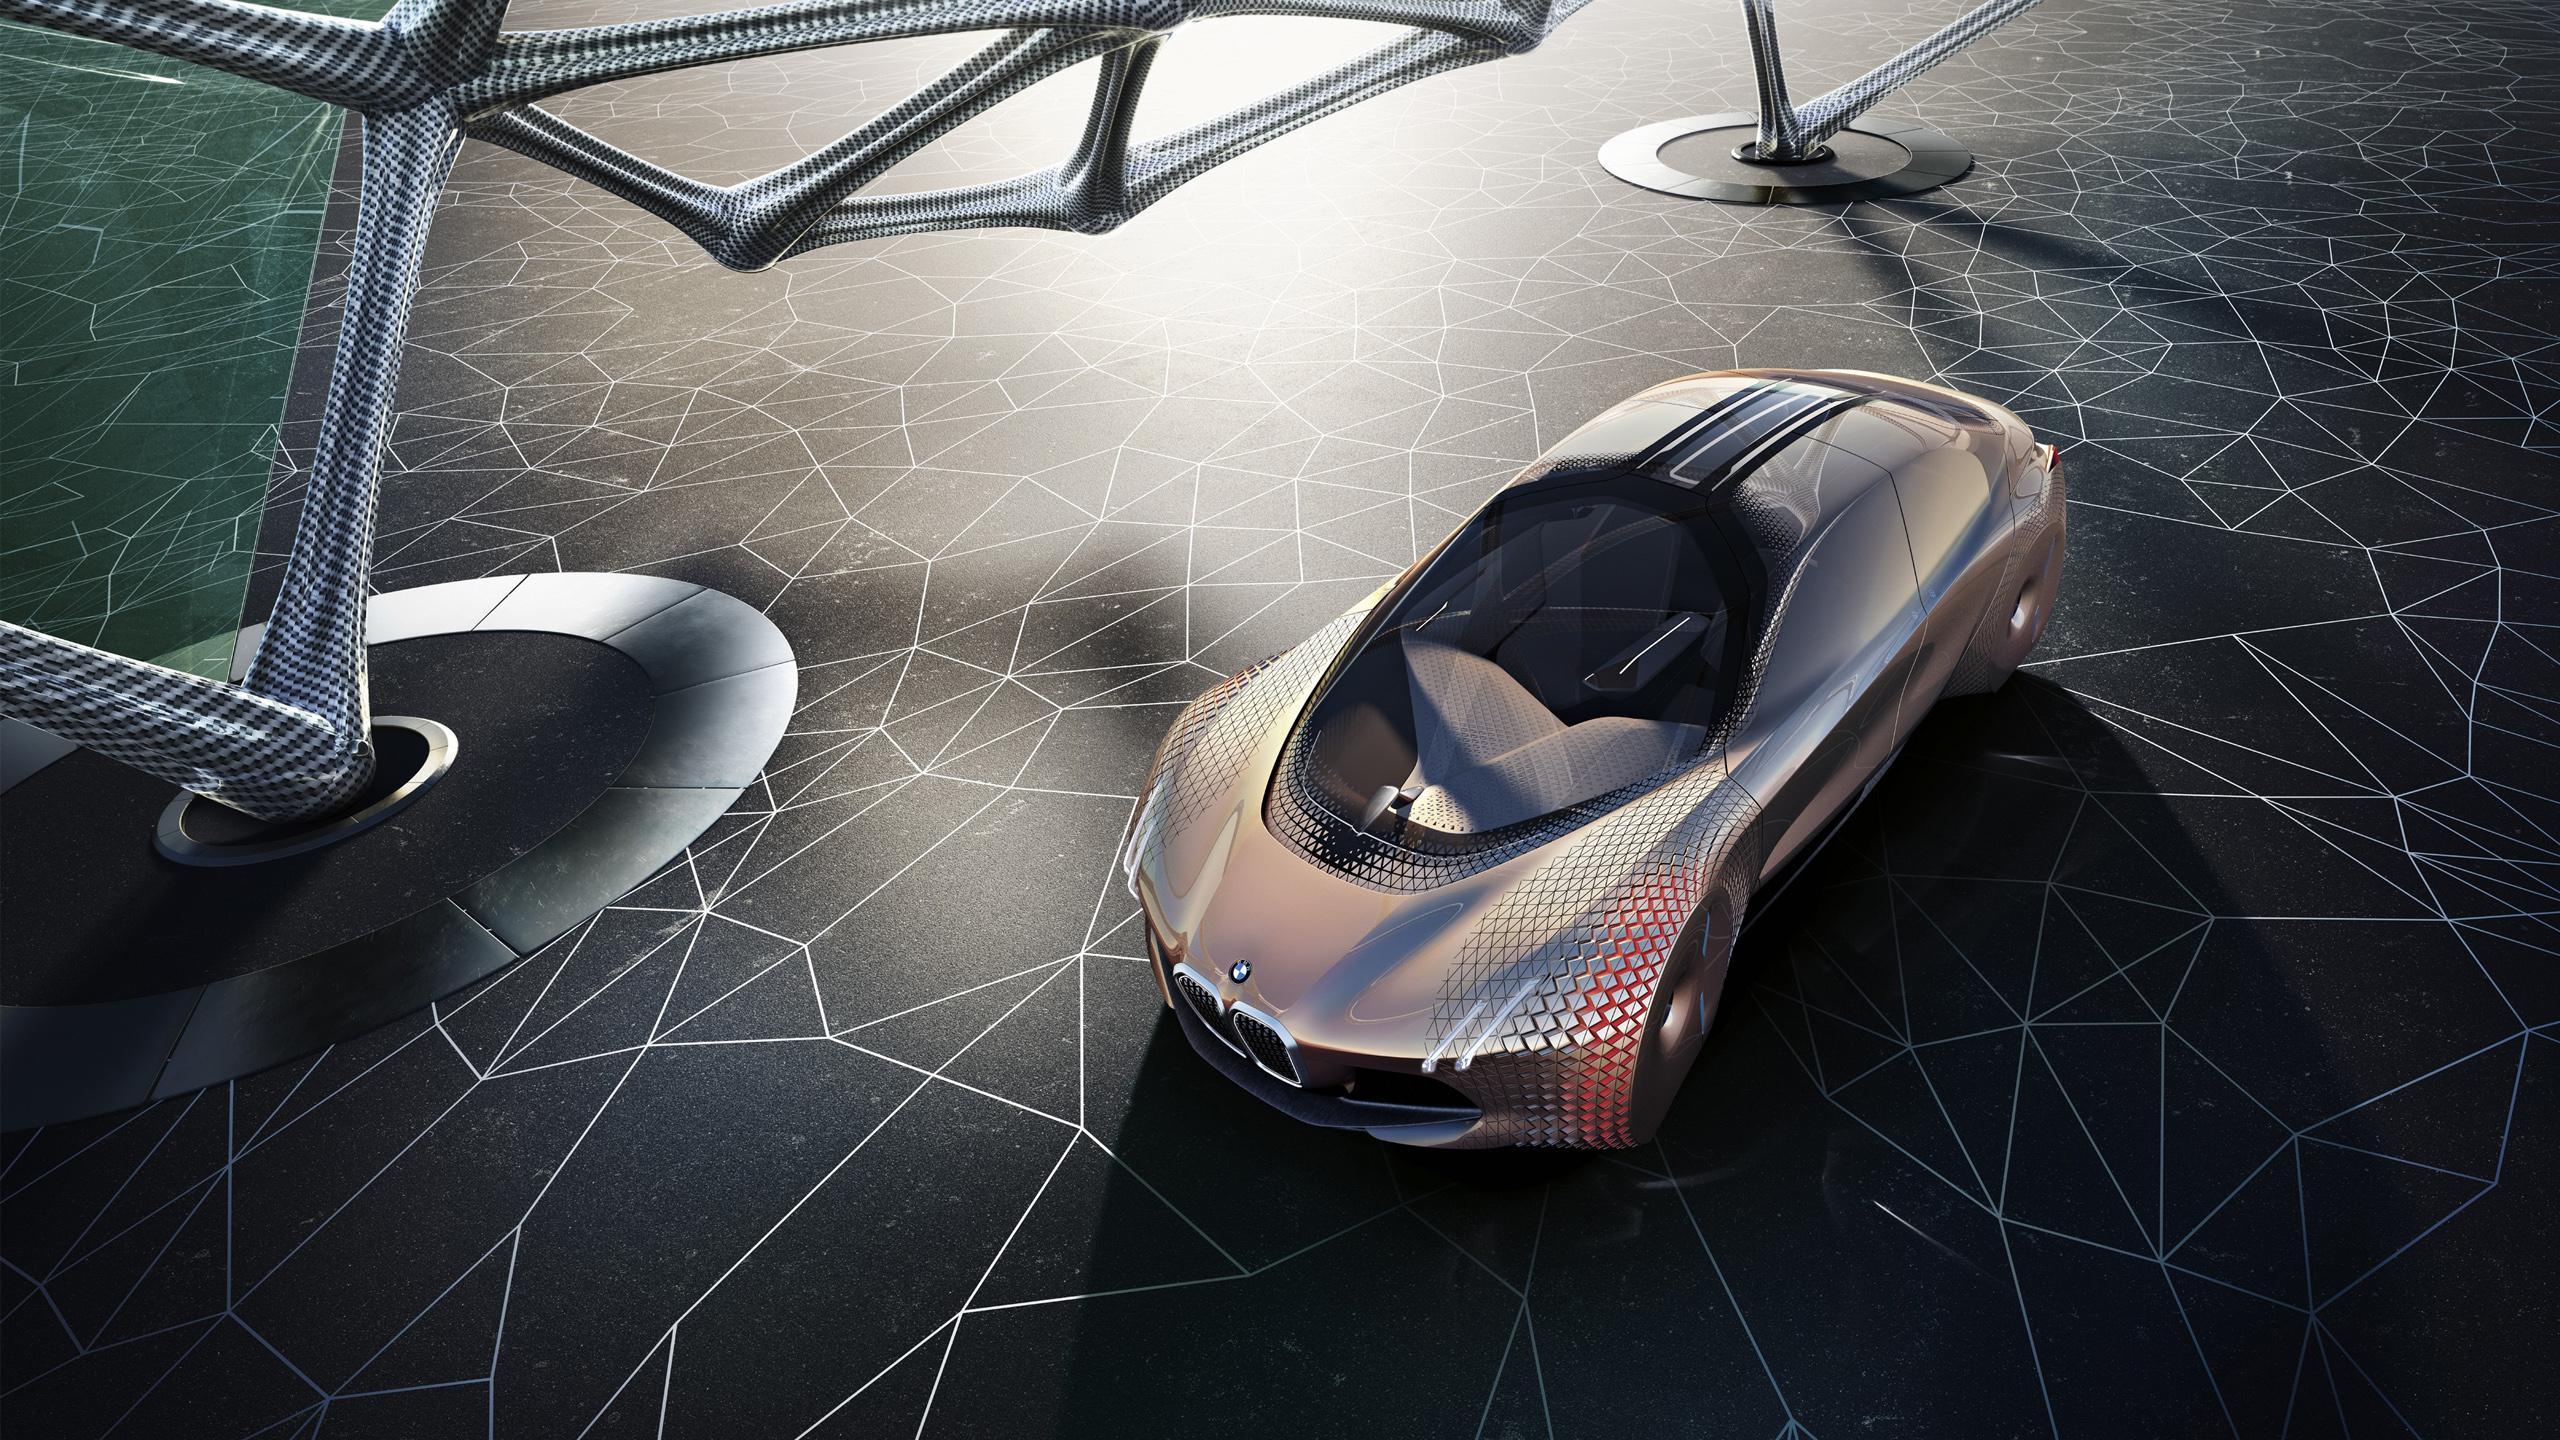 BMW Vision Next 100 Concept Car Wallpaper